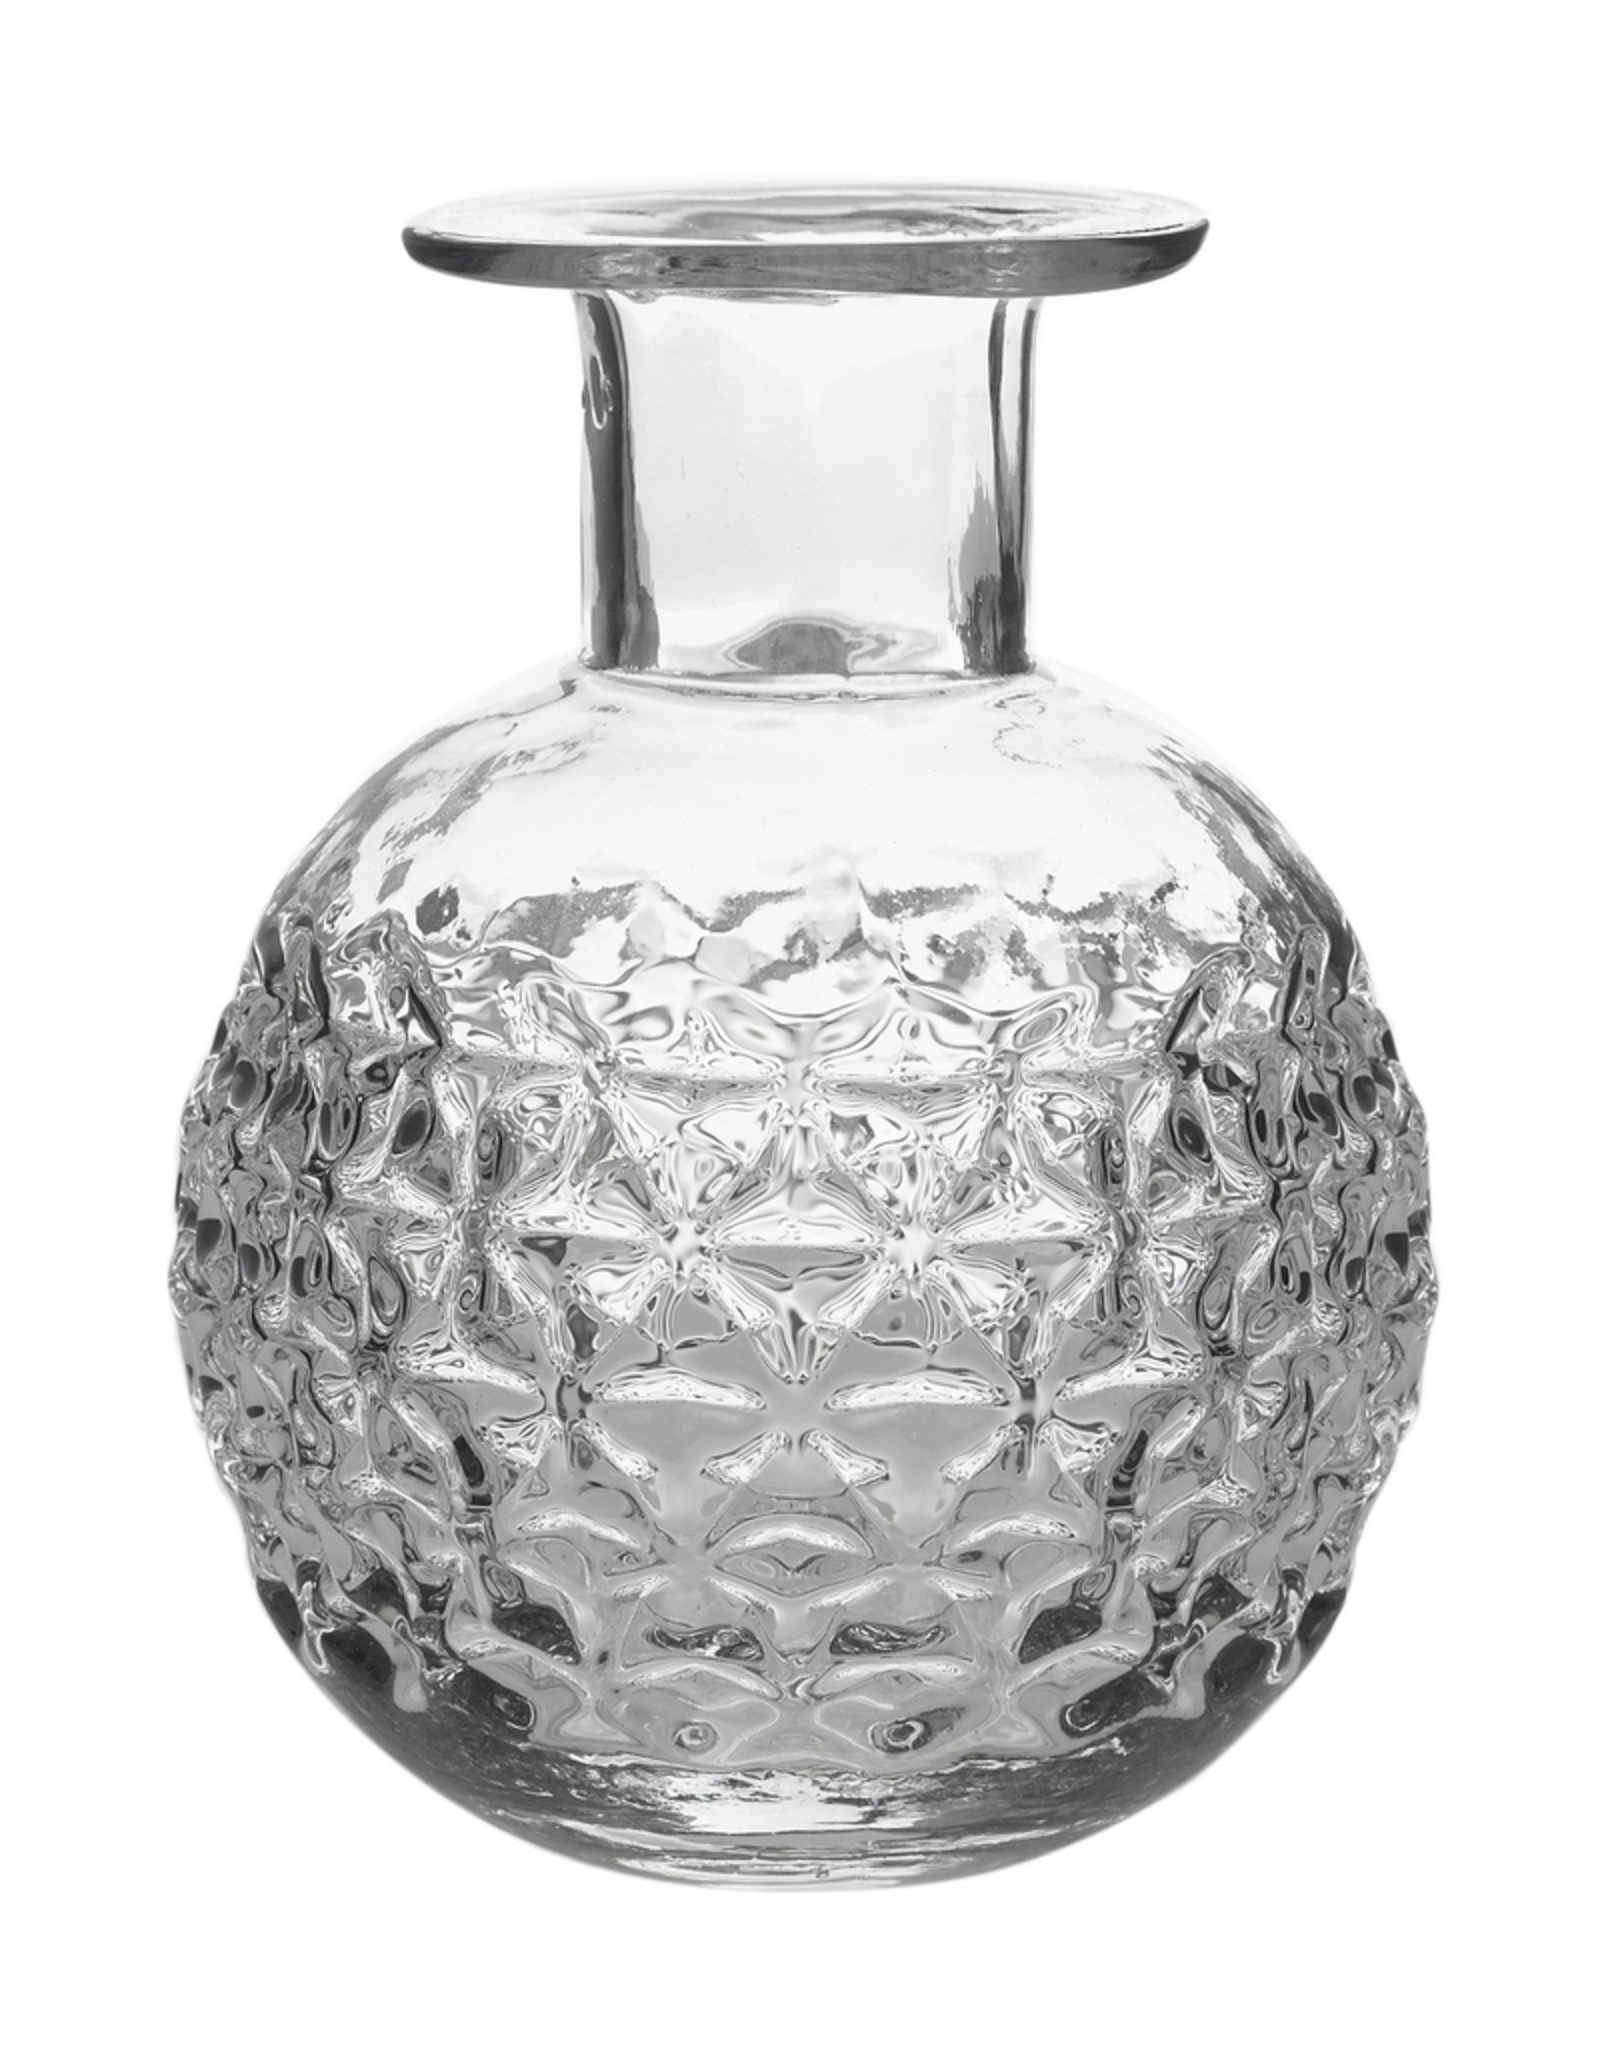 Round Etched Glass Elan Bottle